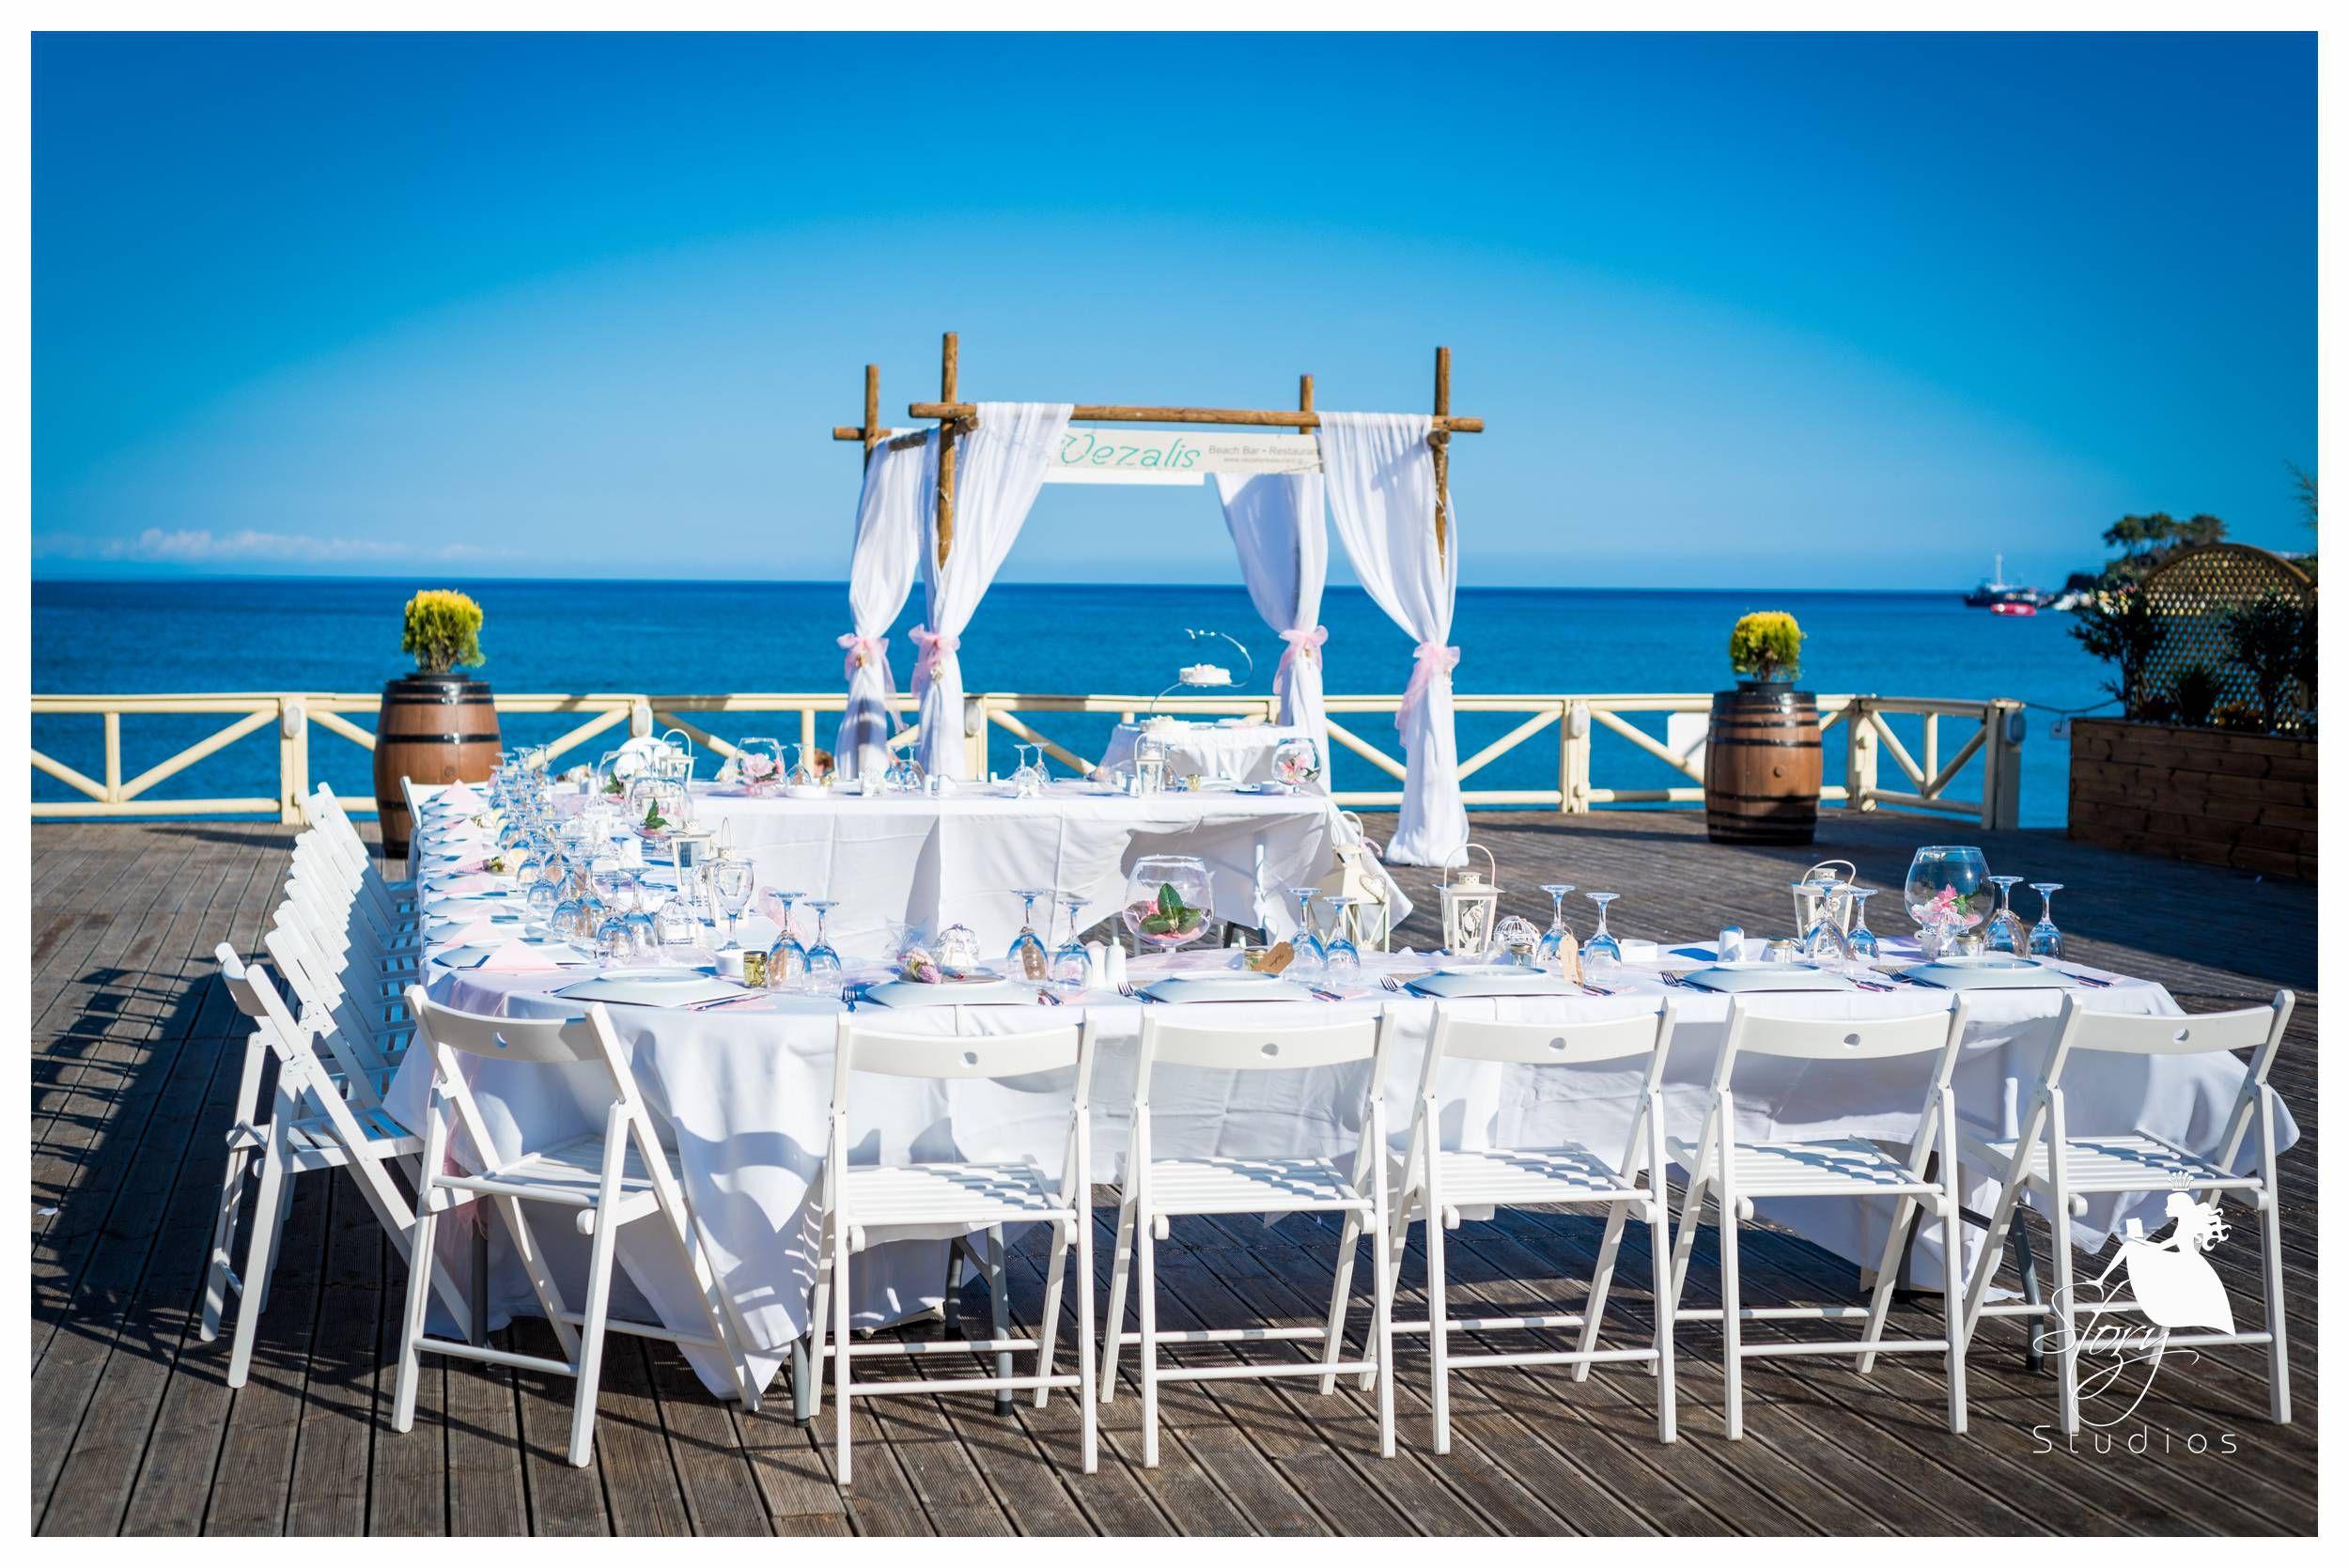 Vezalis Beach Bar Restaurant Is A Beautiful Location To Get